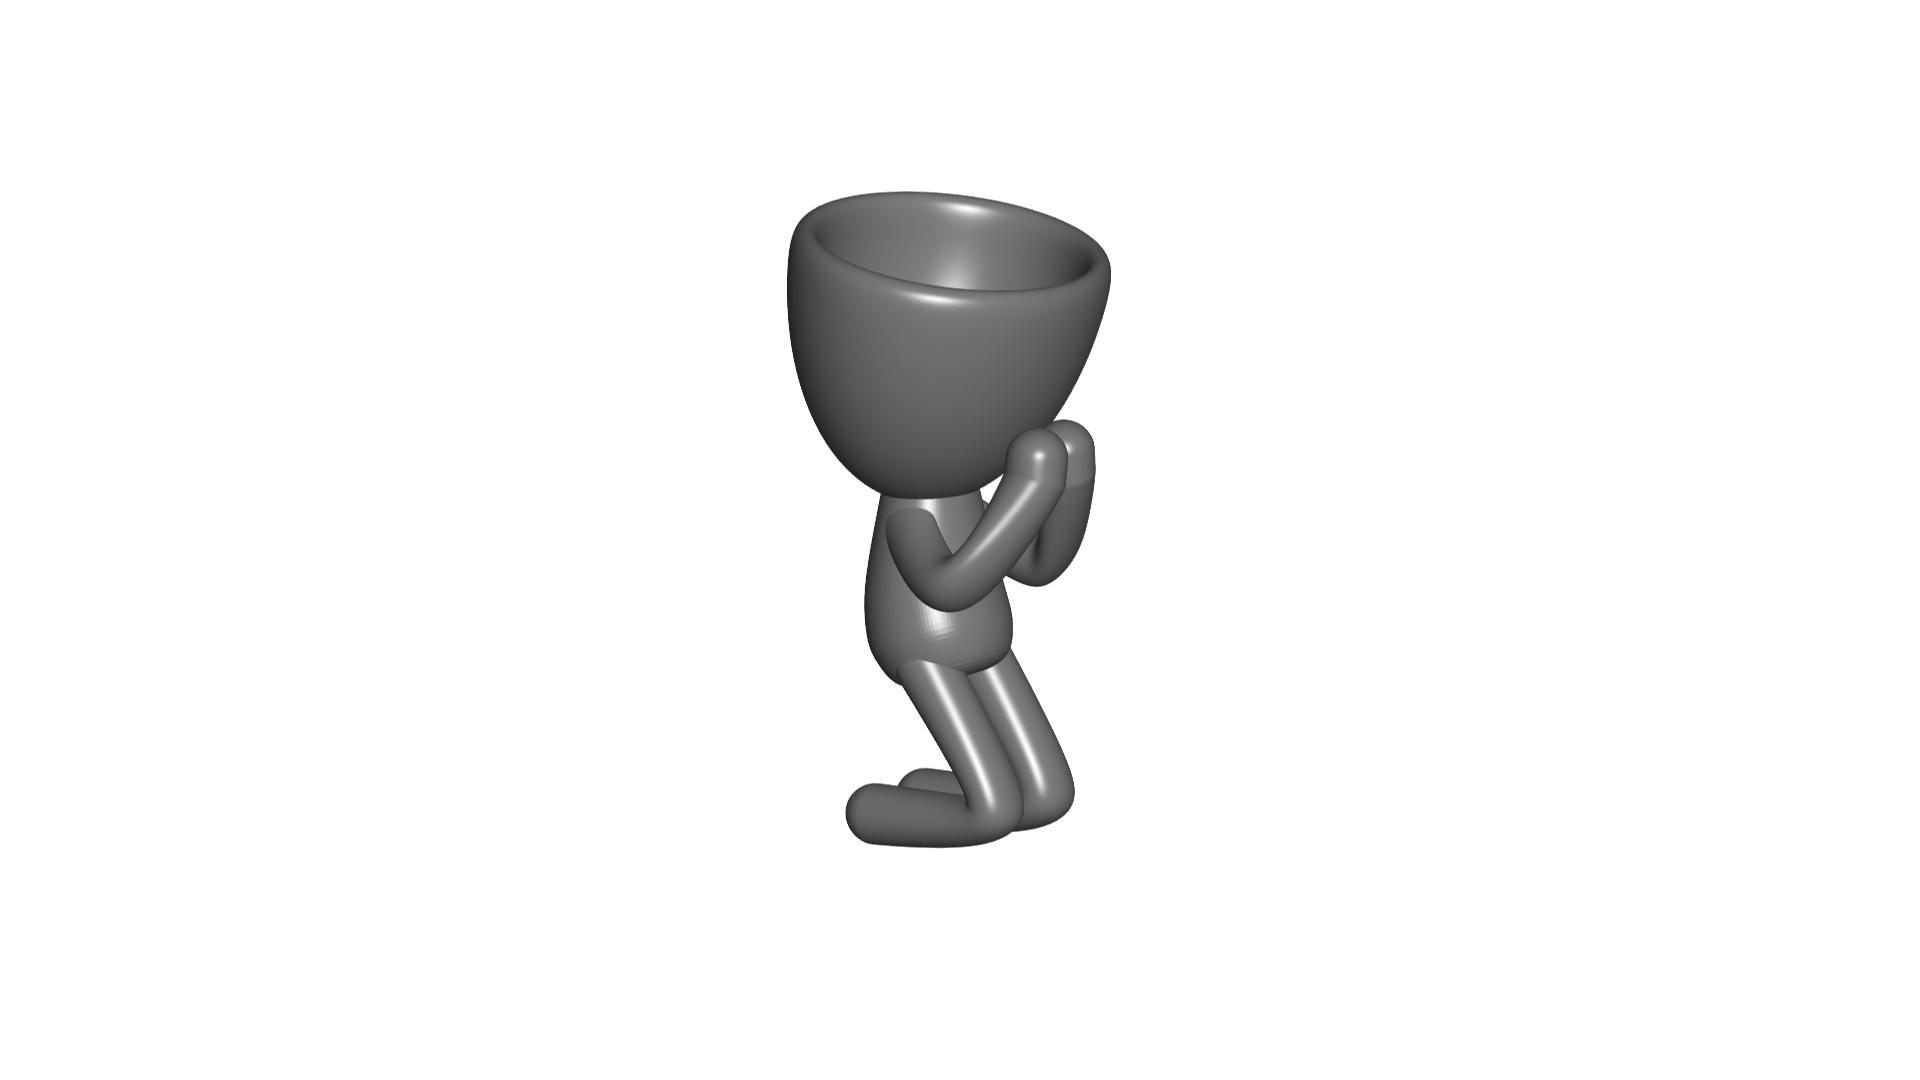 Vaso_09_Gris_1.jpg Download free STL file REZANDO AGRADECIENDO JARRÓN MACETA ROBERT 09 - PRAYING THANKING VASE FLOWERPOT ROBERT 09 • 3D printer model, PRODUSTL56